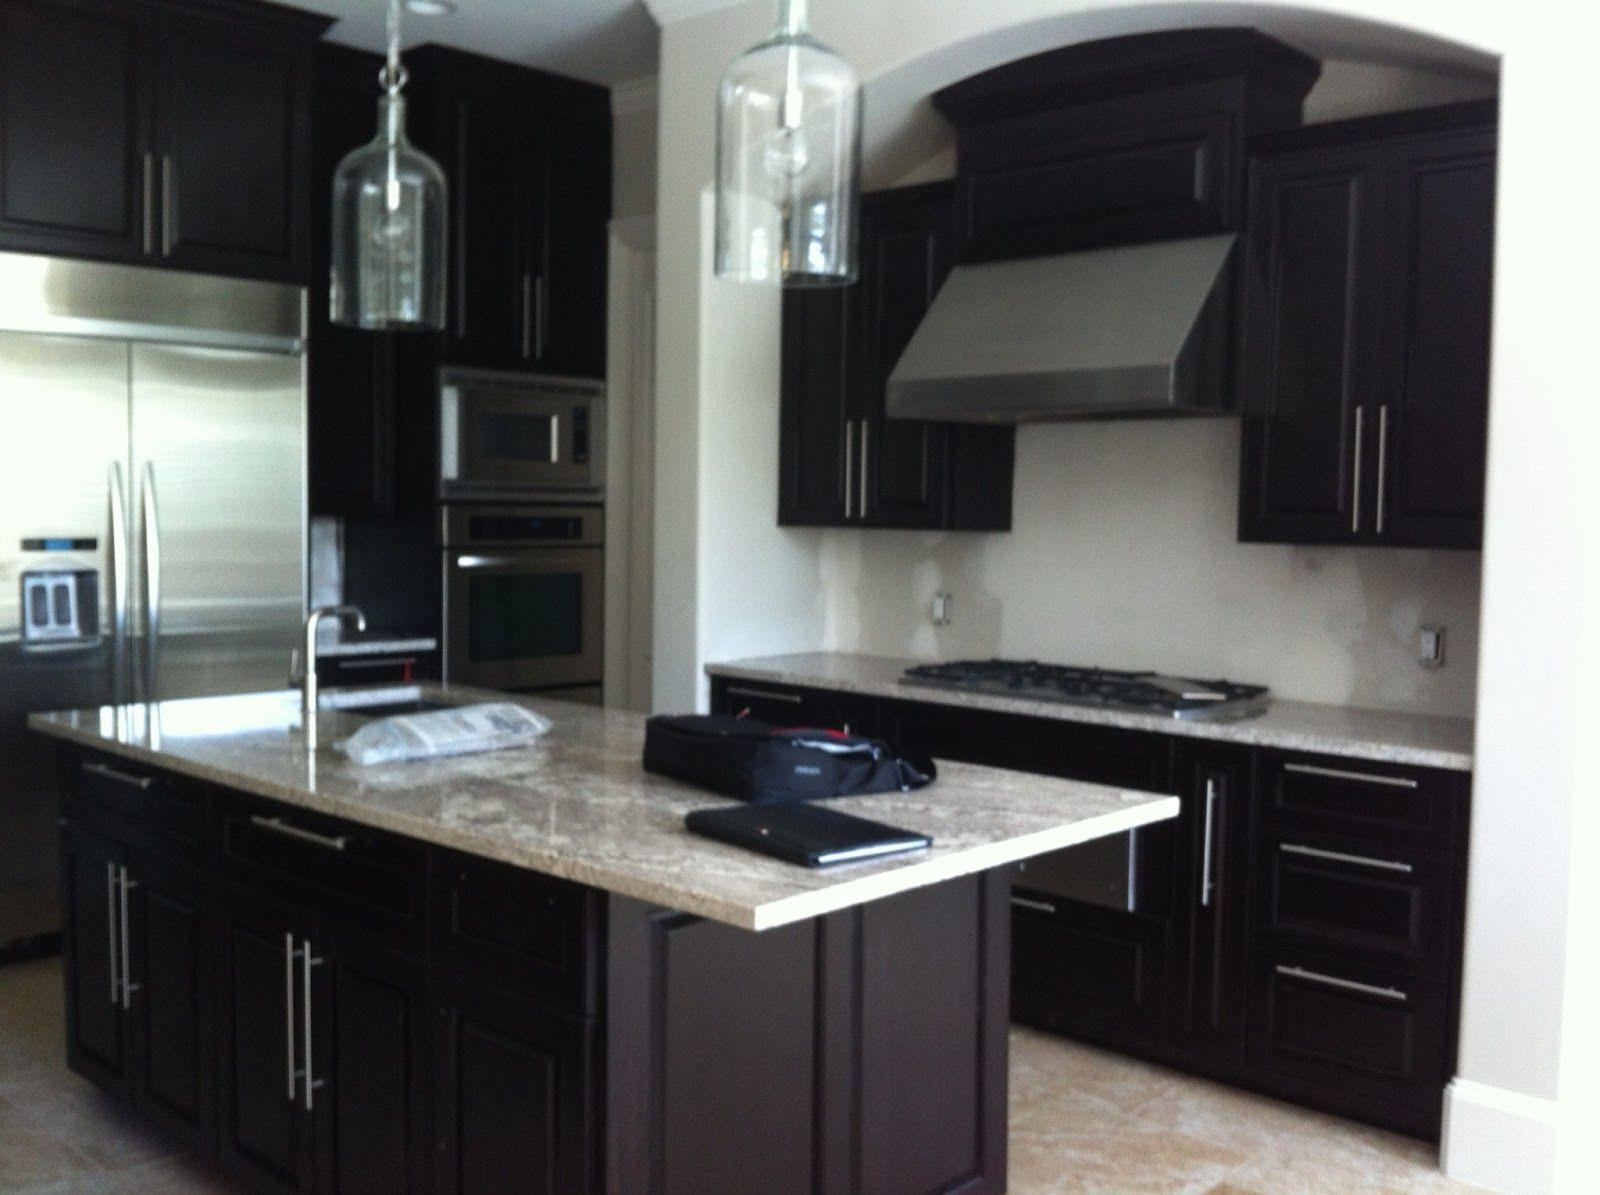 kitchen floor tile ideas with dark cabinets dark kitchen cabinets Images About Kitchens On Custom Cabinets Modern